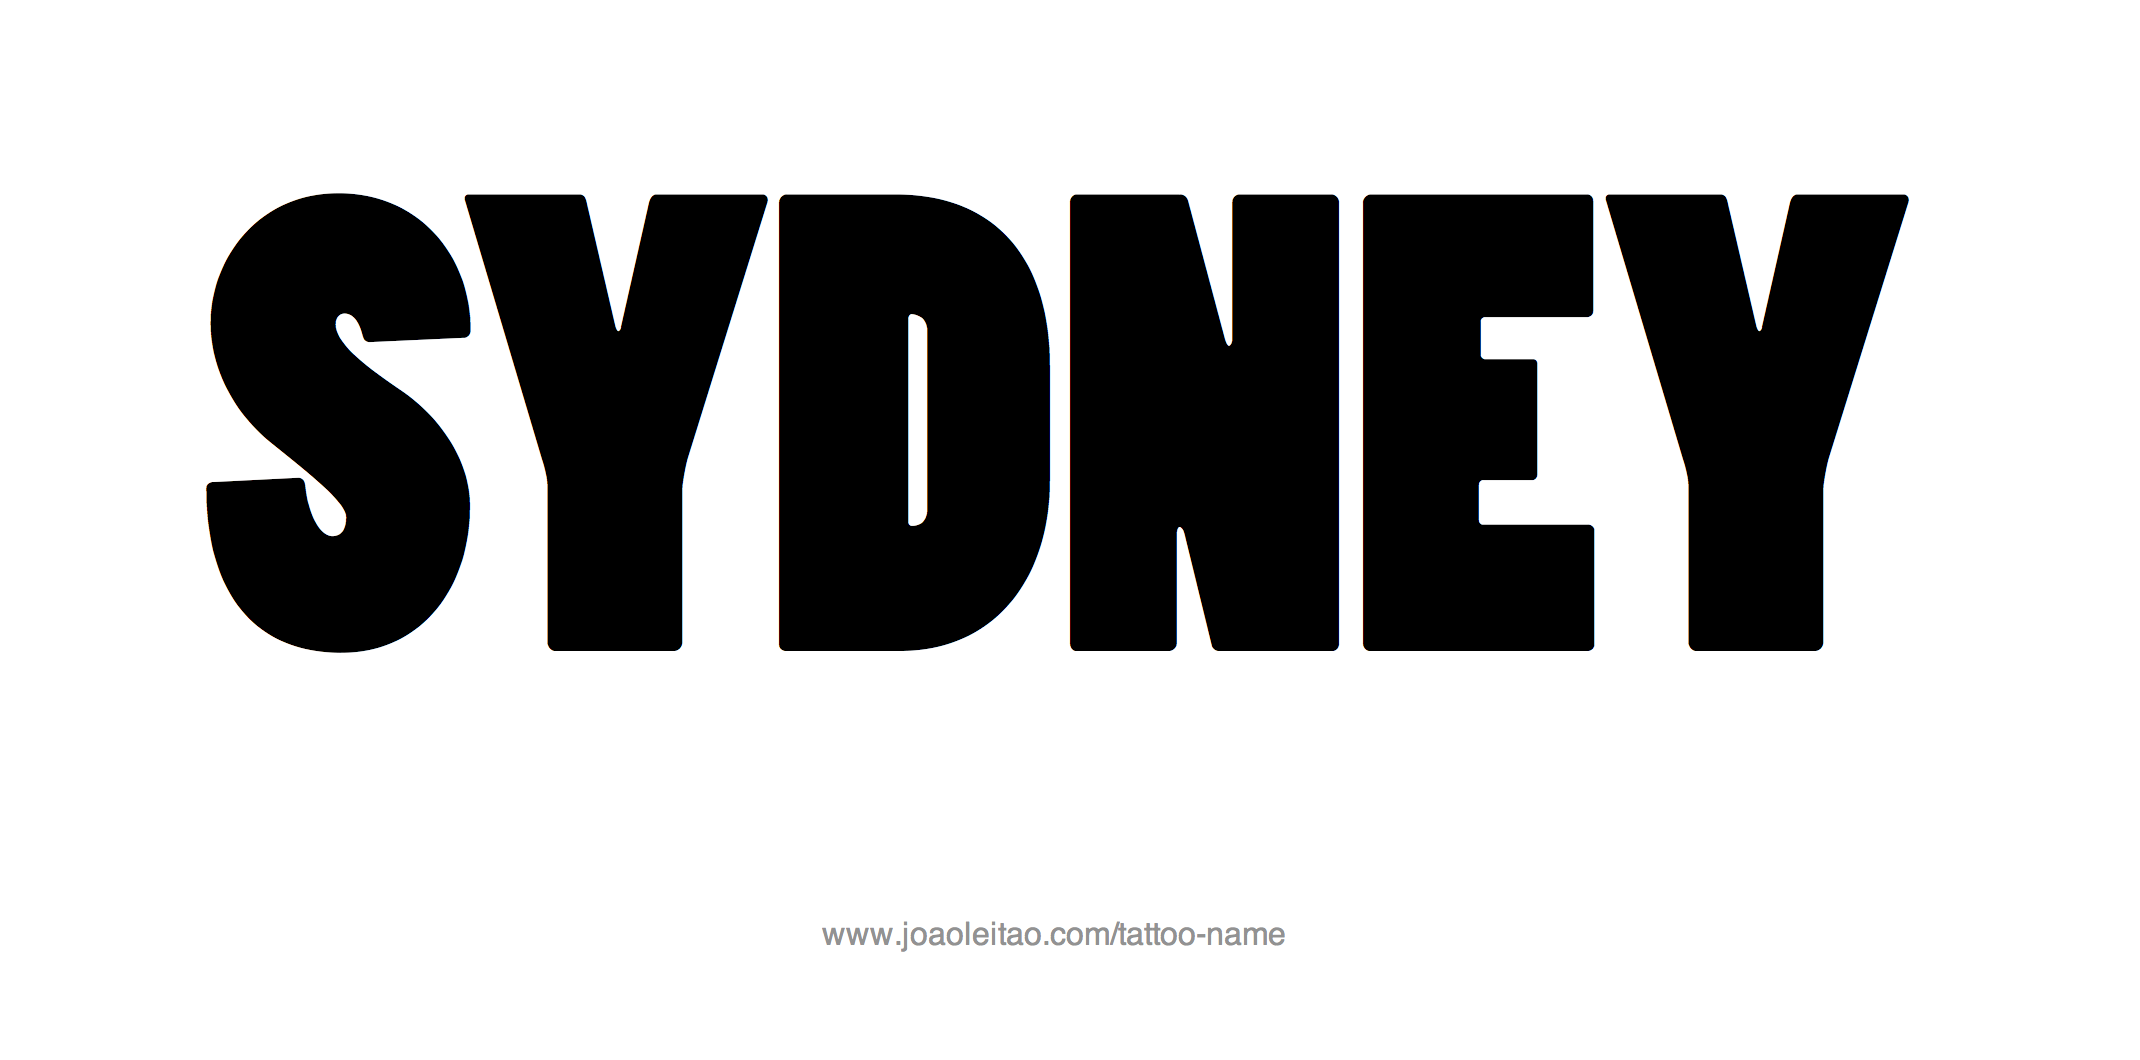 Sydney Name Tattoo Designs